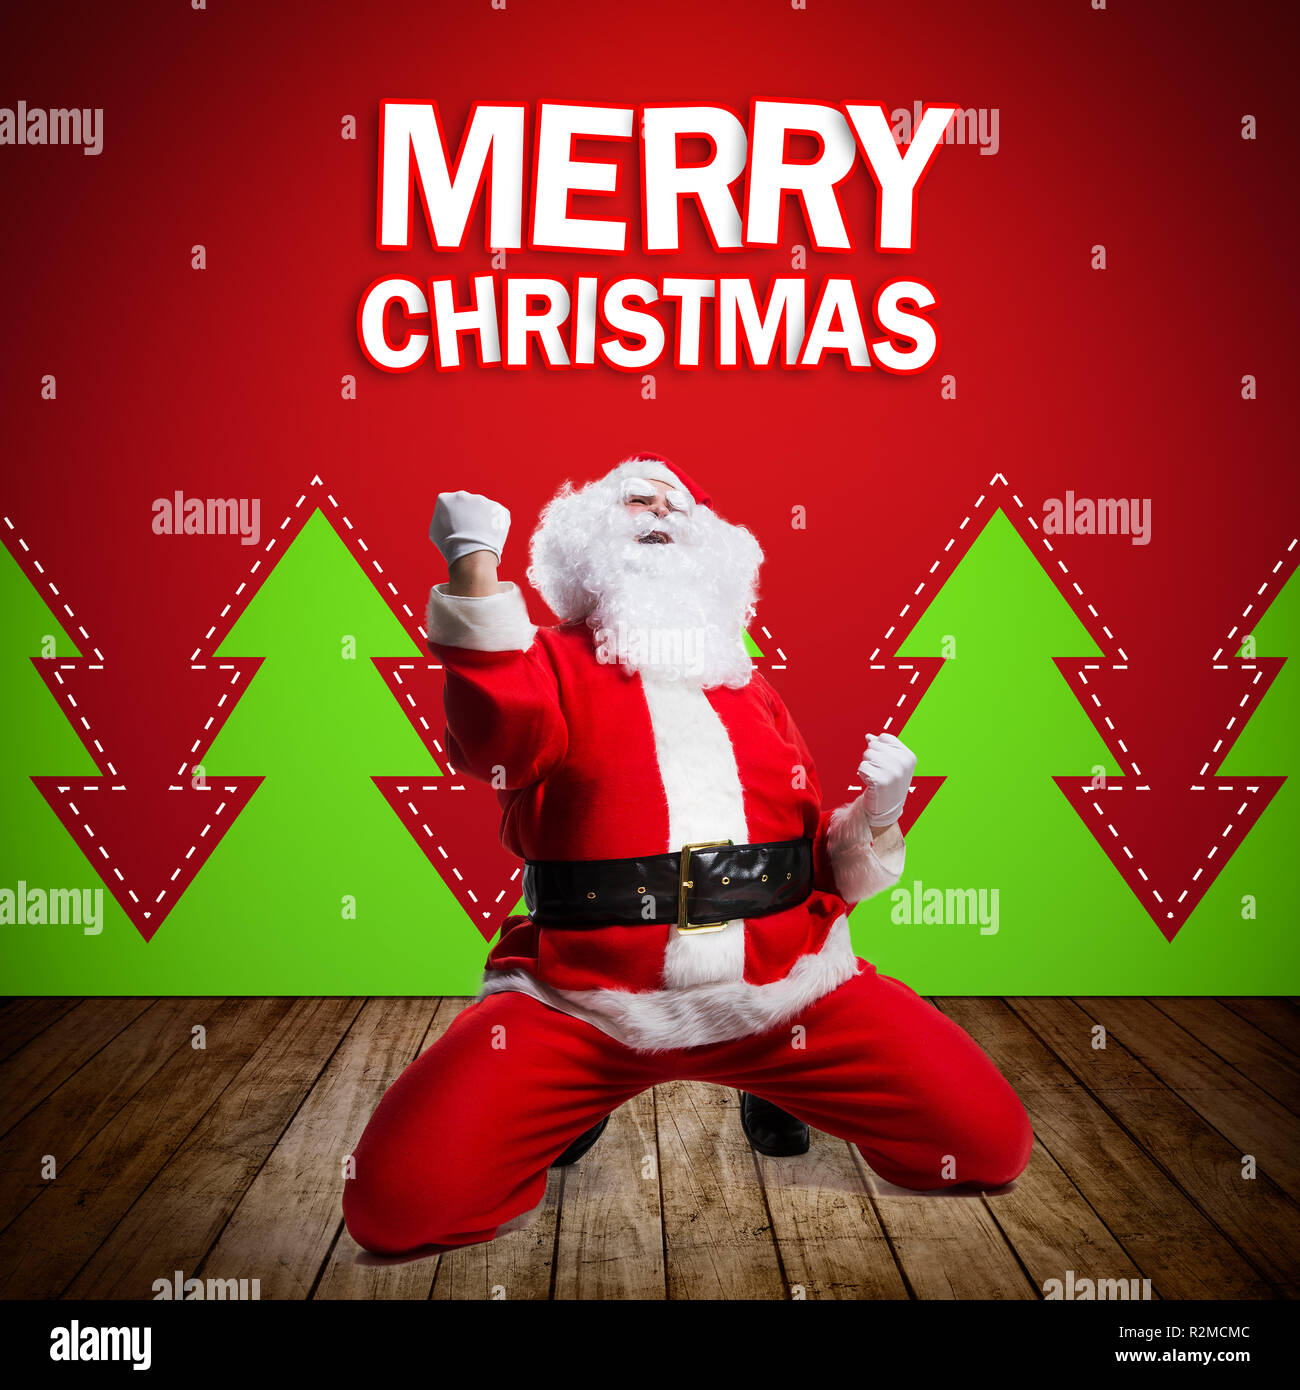 Happy Christmas Message Stockfotos & Happy Christmas Message Bilder ...